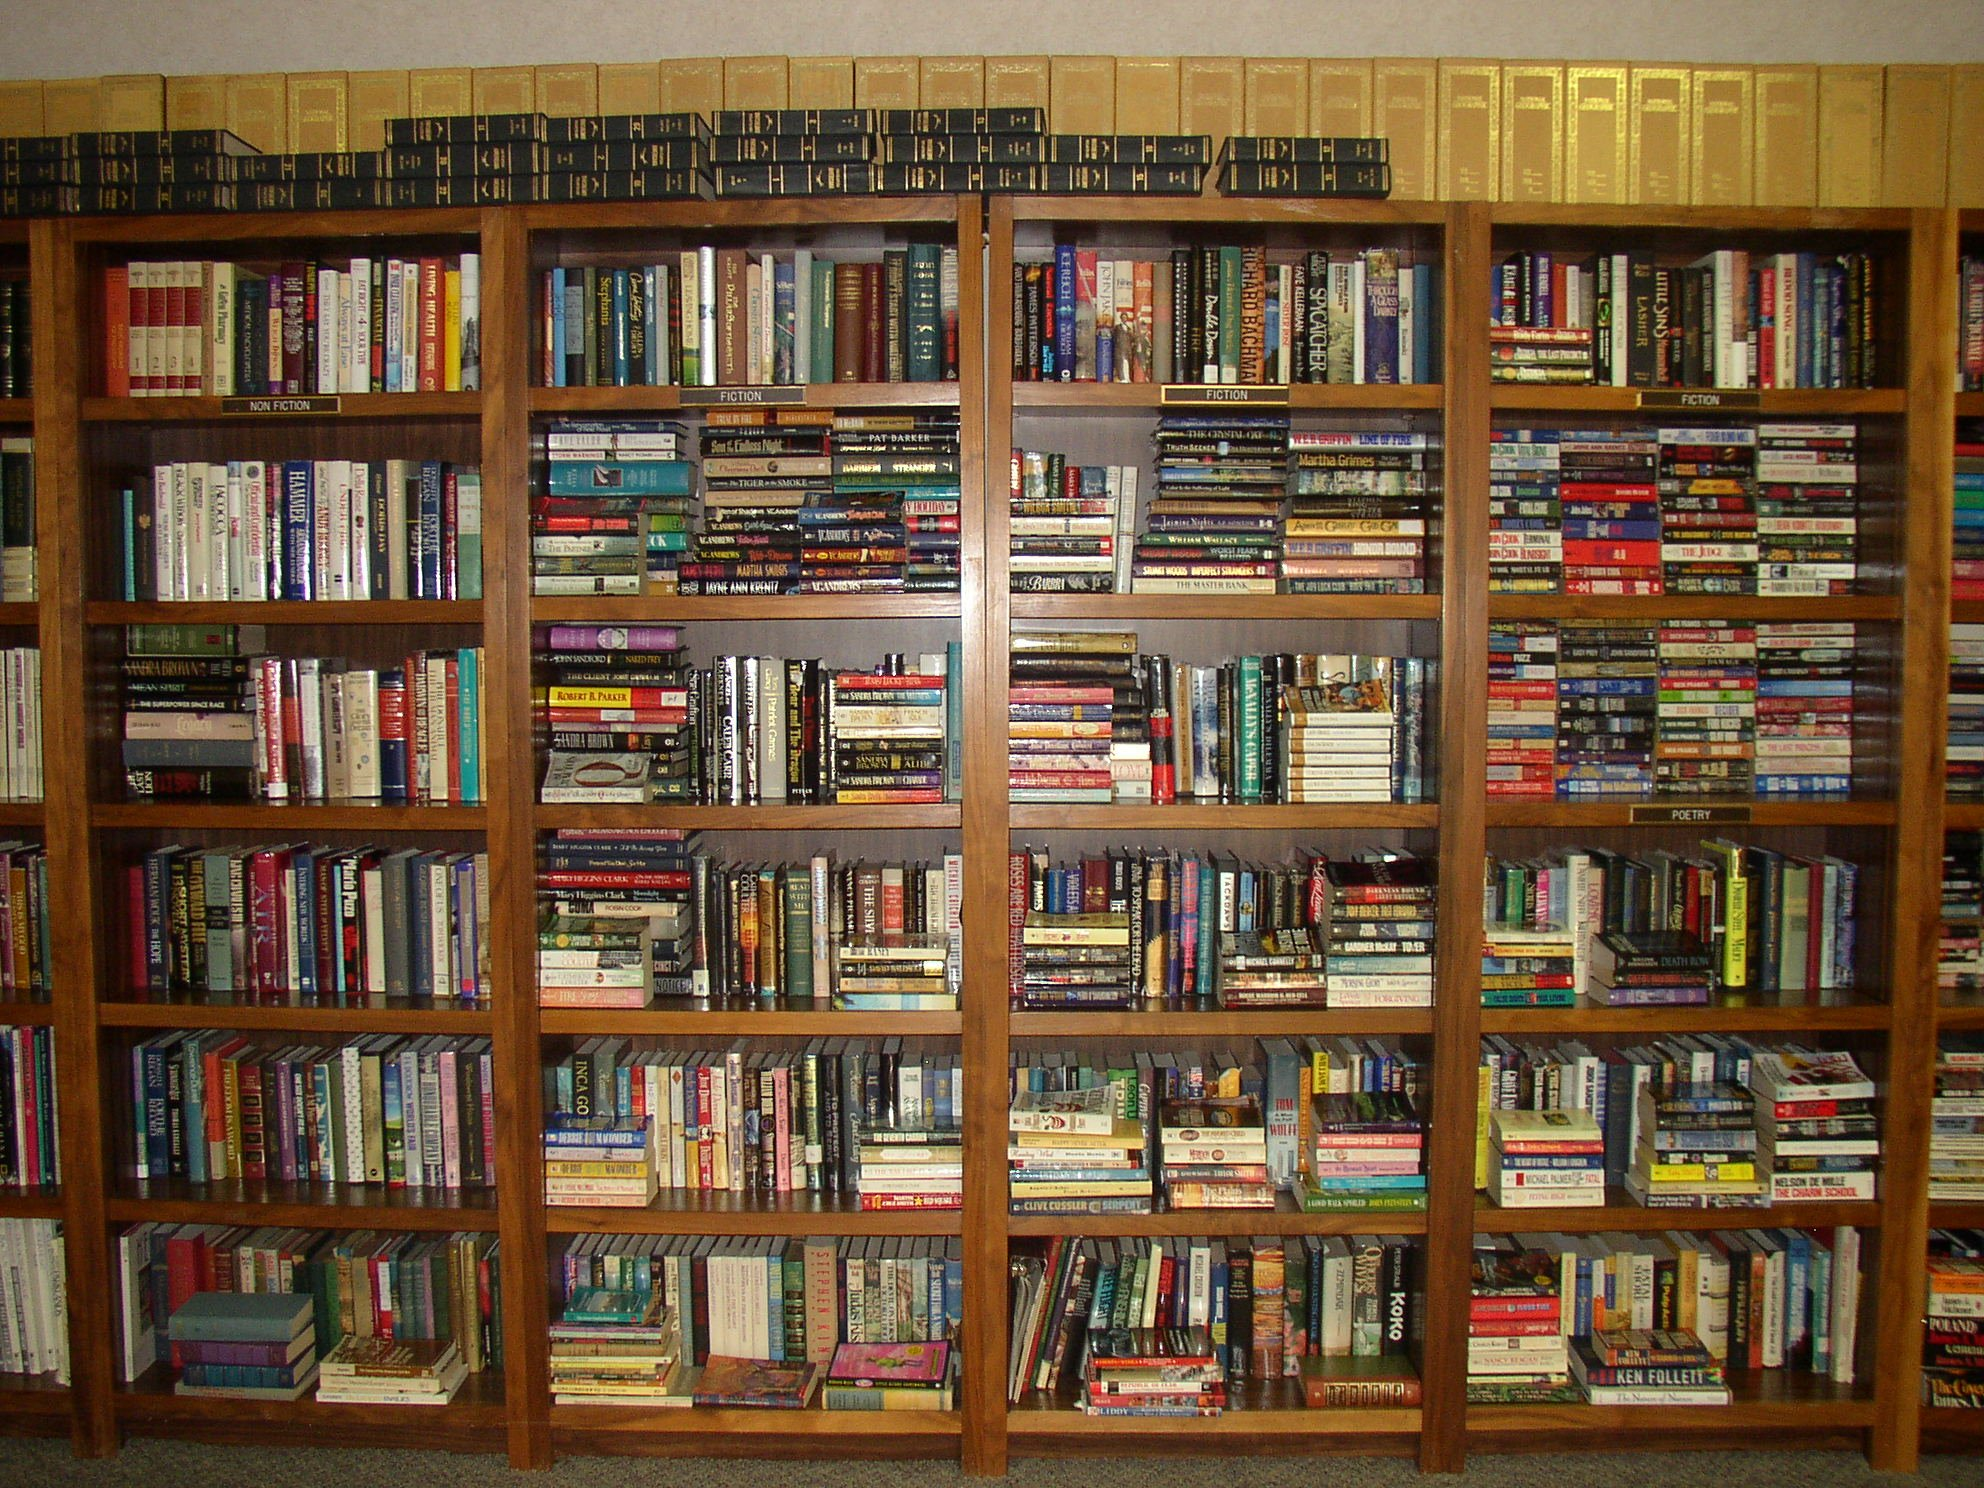 1397106477 book shelves uwi library  berkeley beacon master s conflicted copy 2014 04 09 .jpg